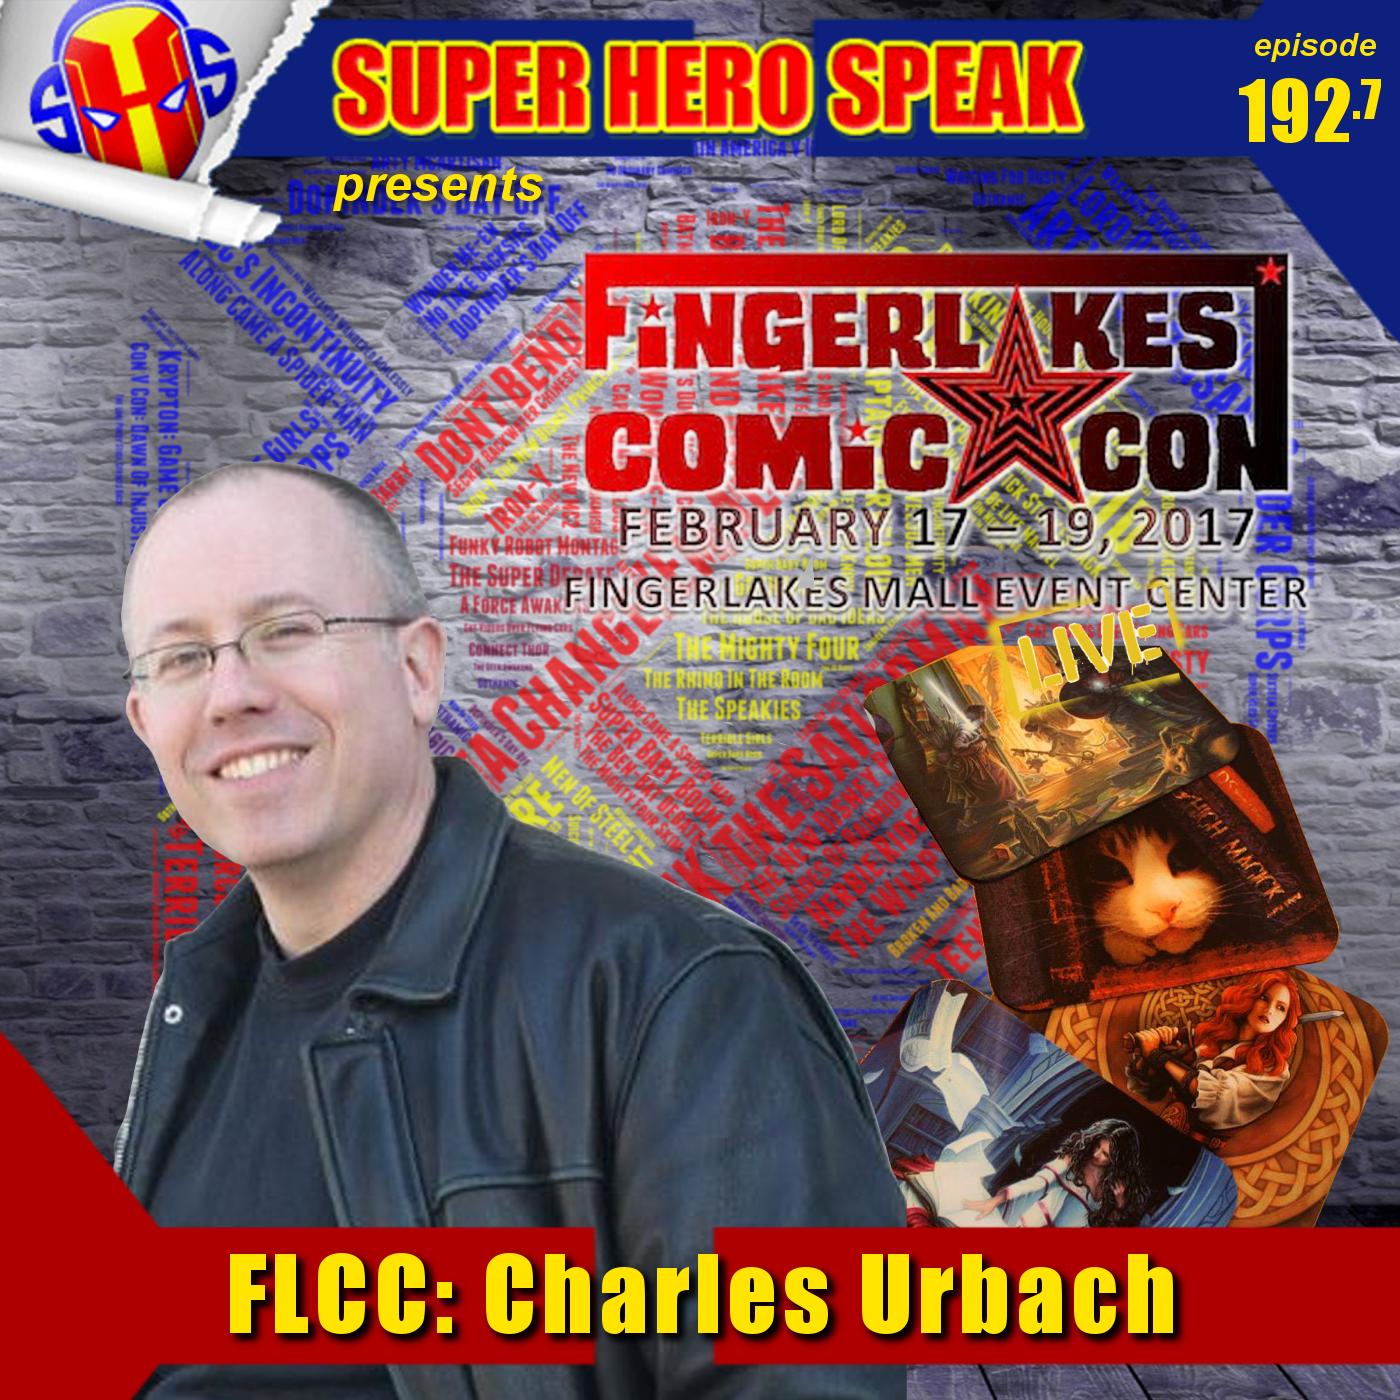 #192.7: FLCC Charles Urbach